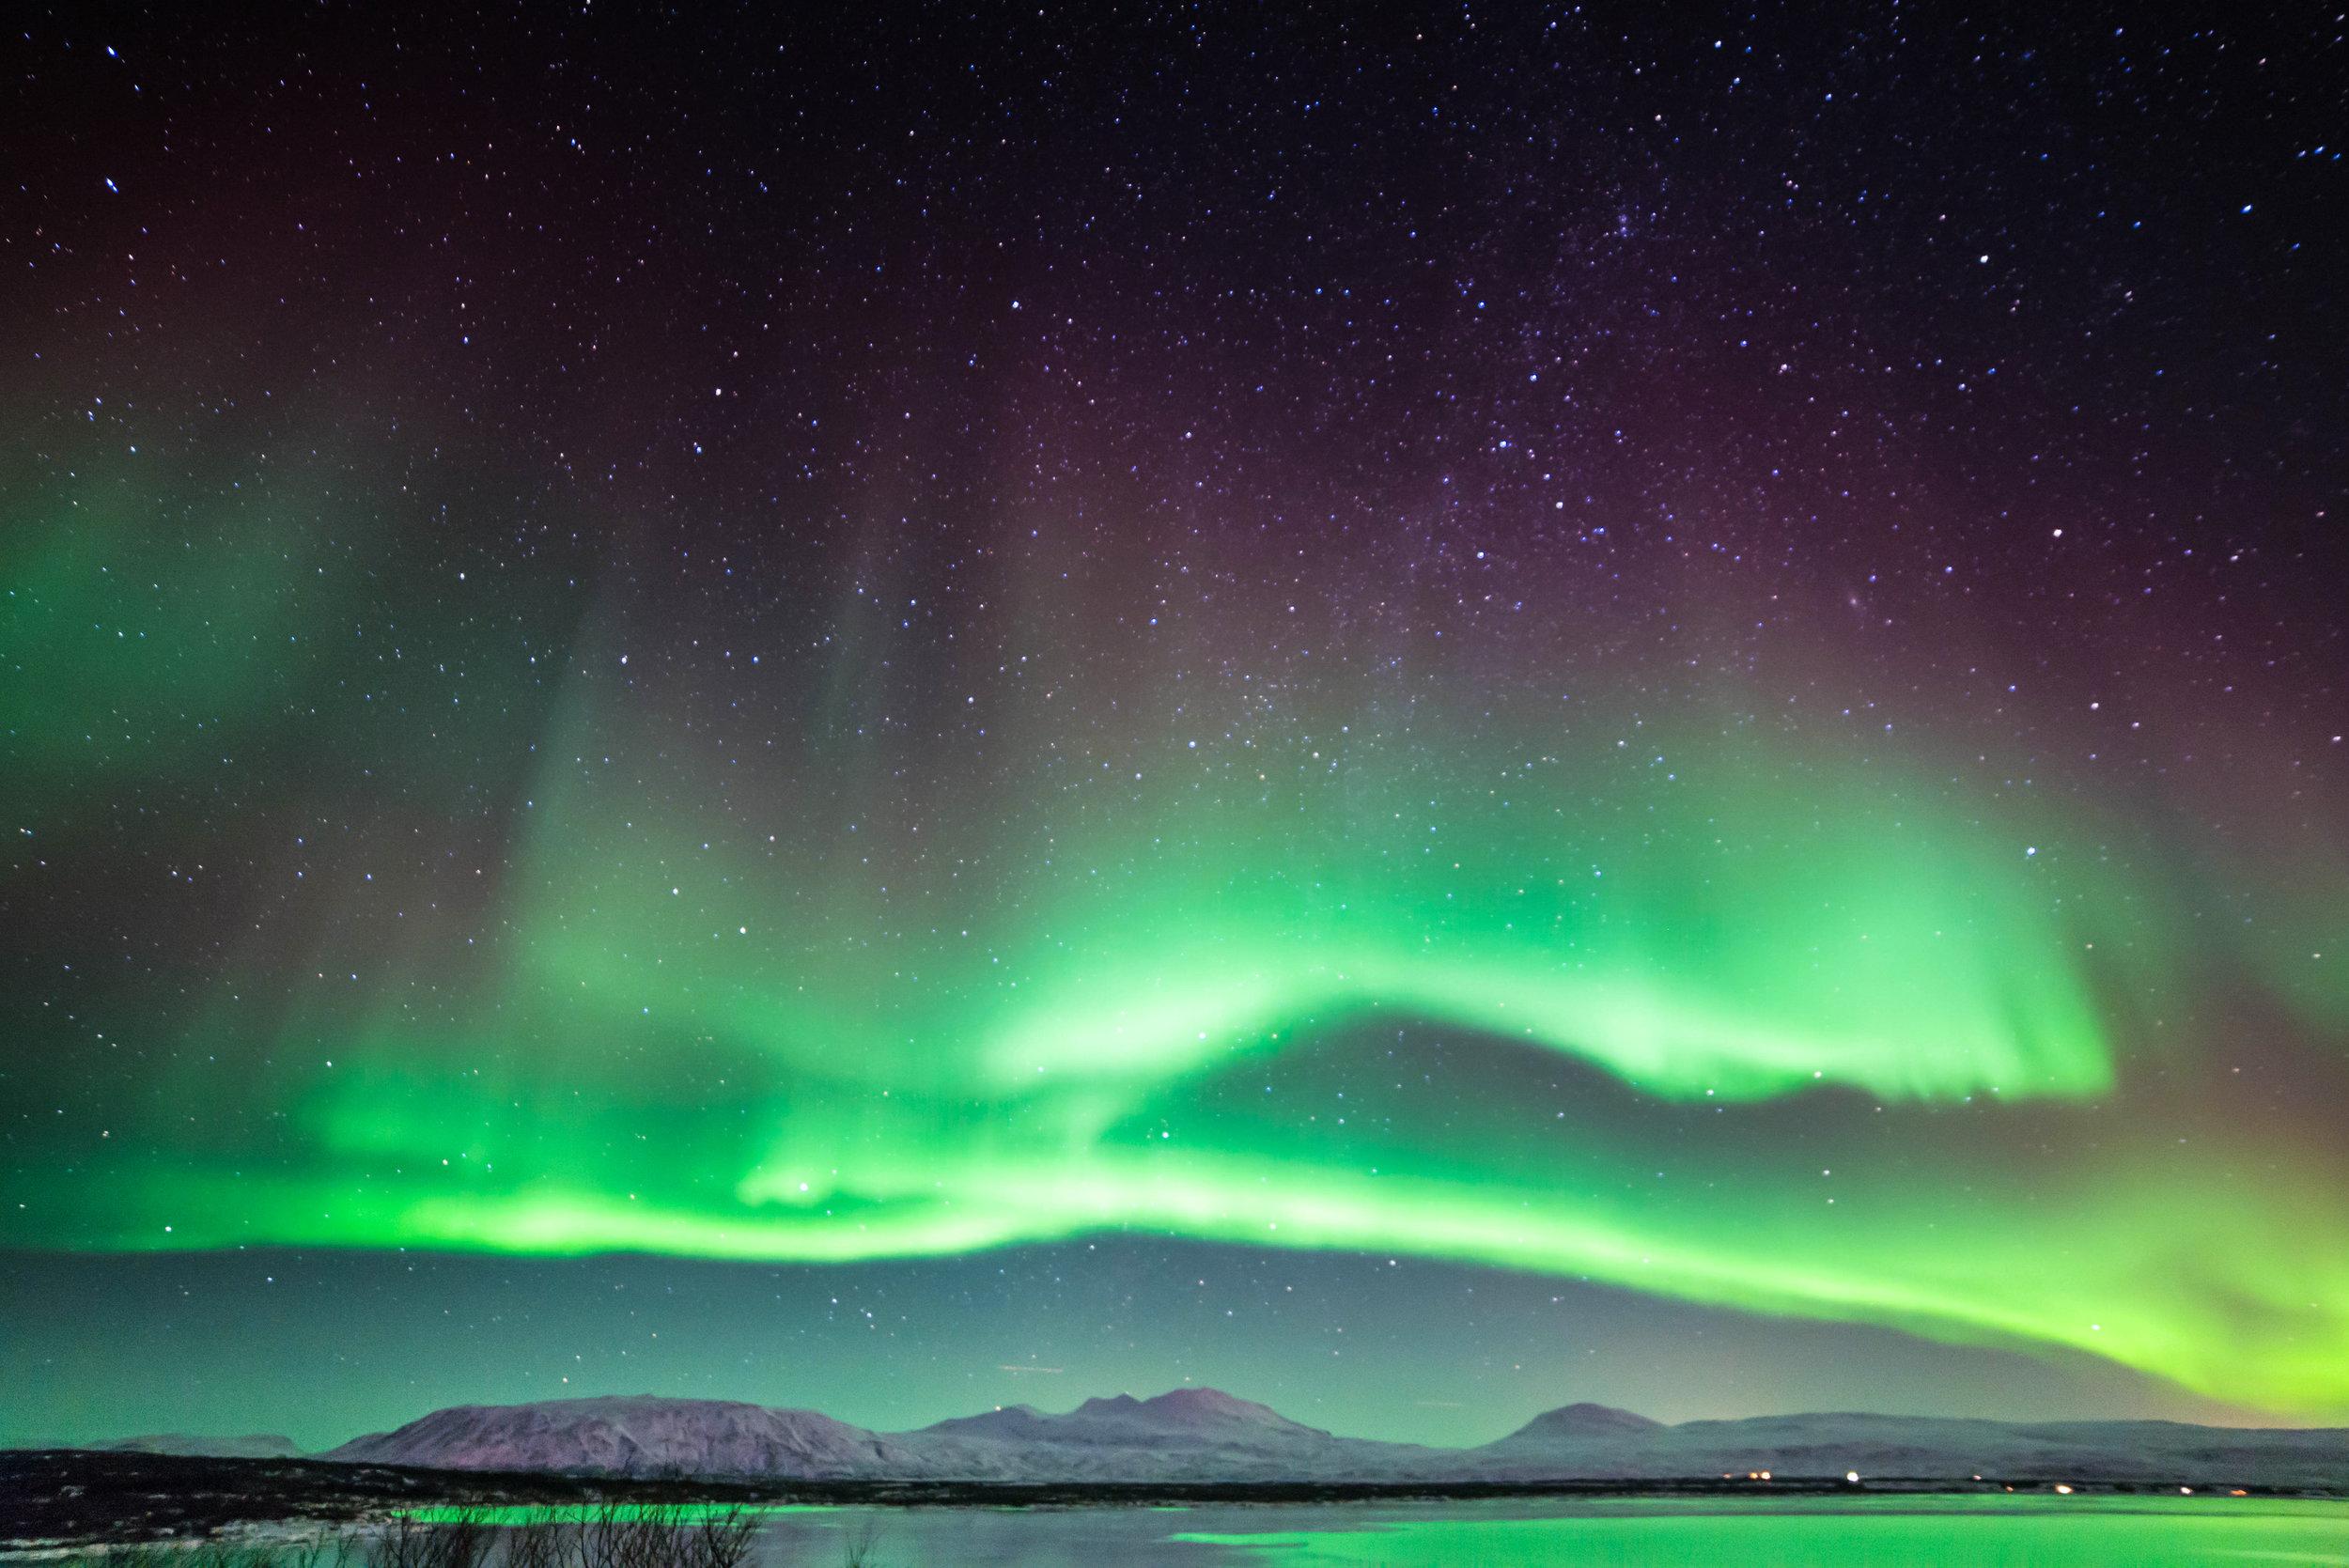 Green Northern lights